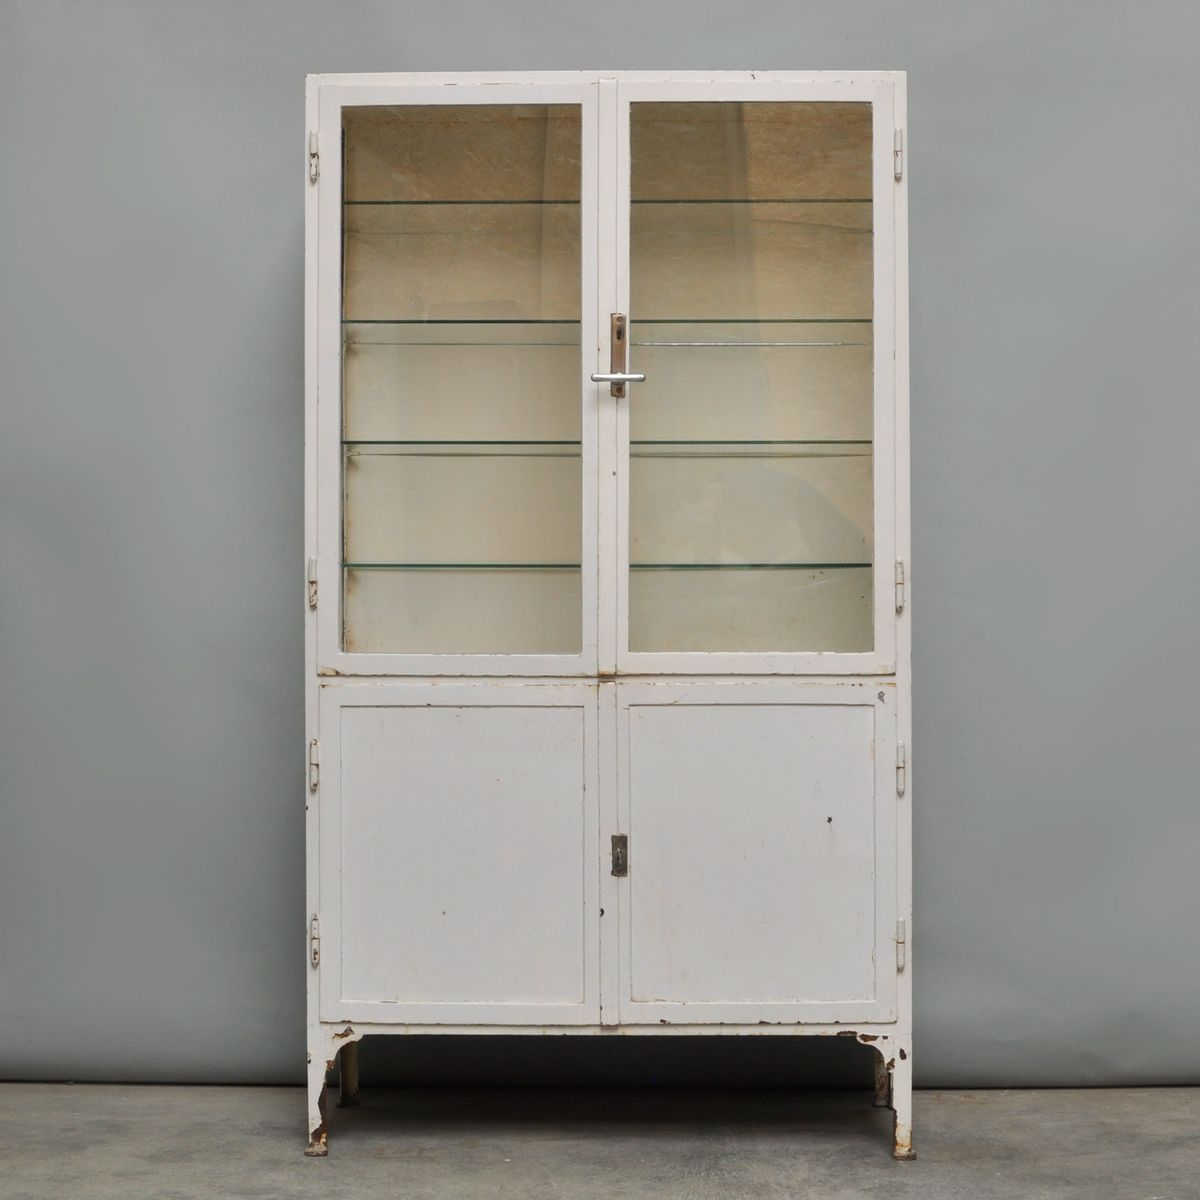 Delicieux Vintage Steel And Glass Medicine Cabinet, 1940s